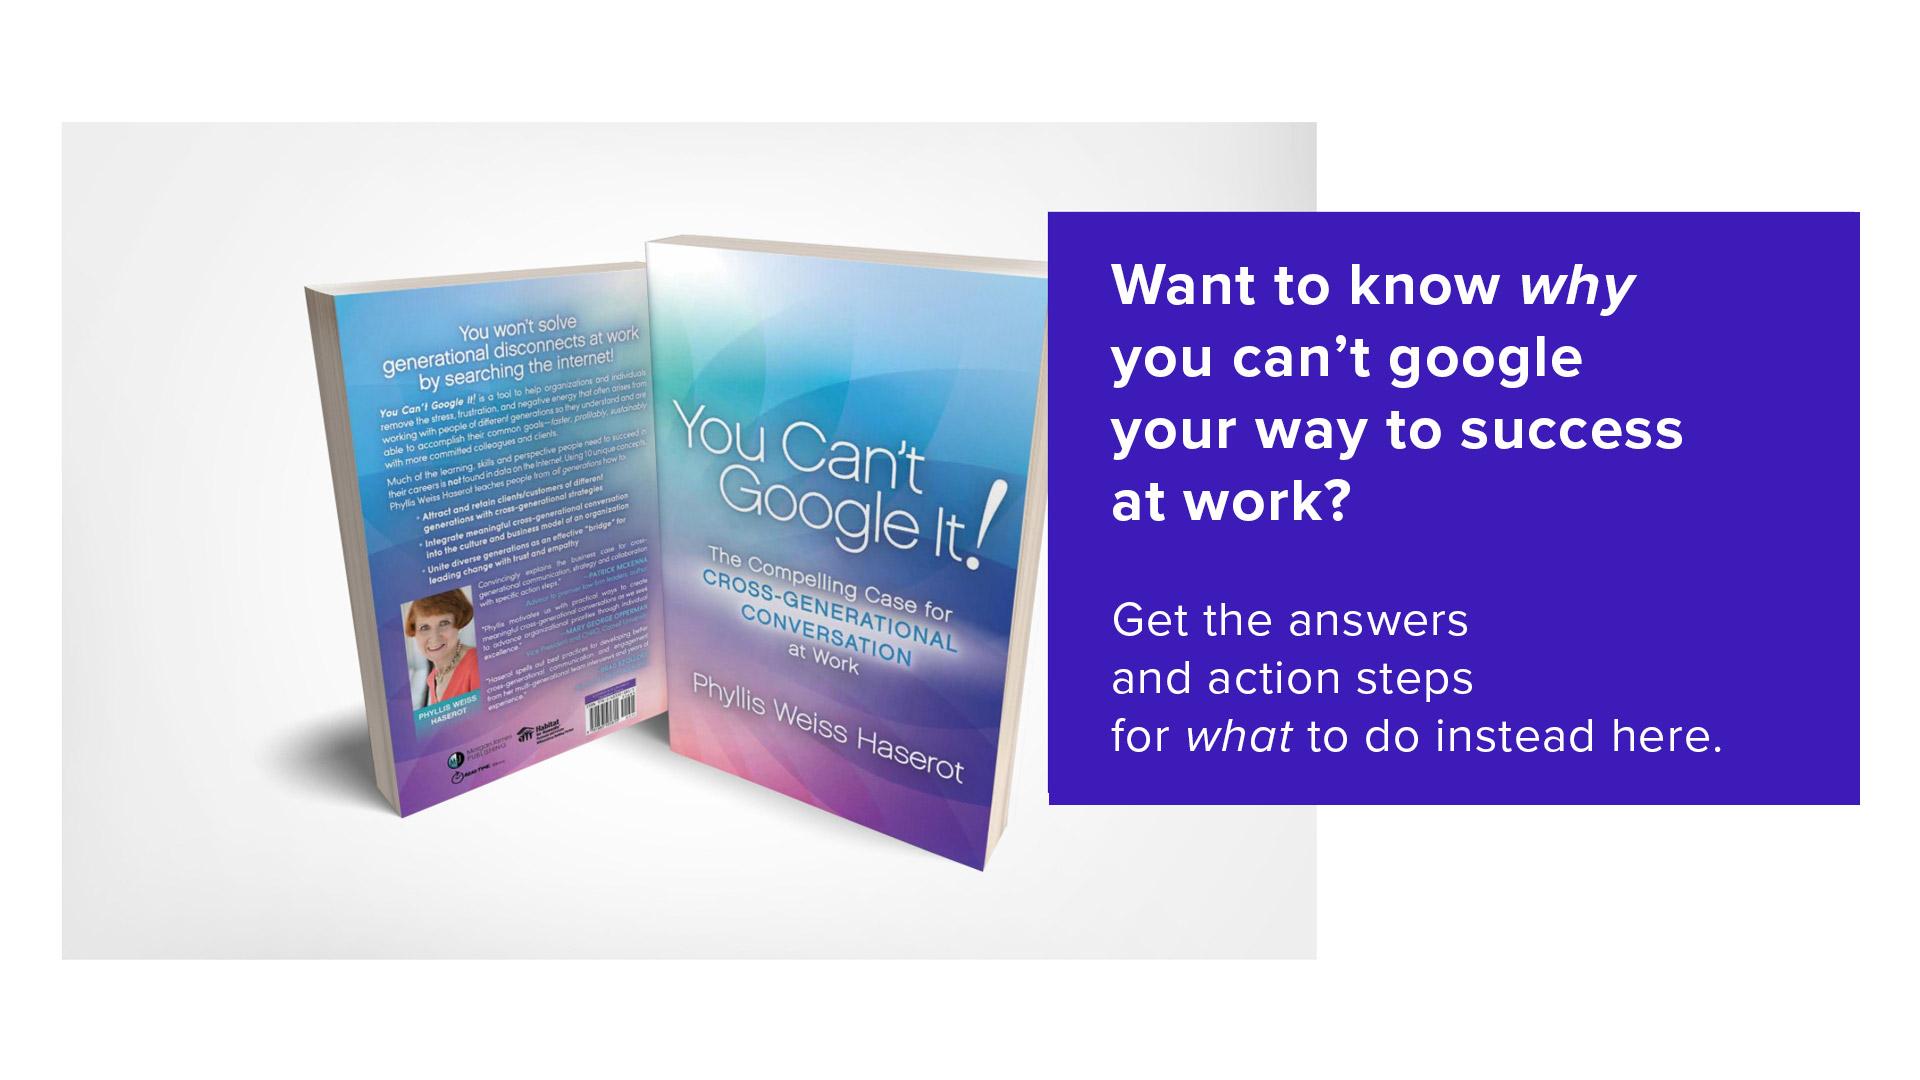 YCGI-succes-at-work.jpg